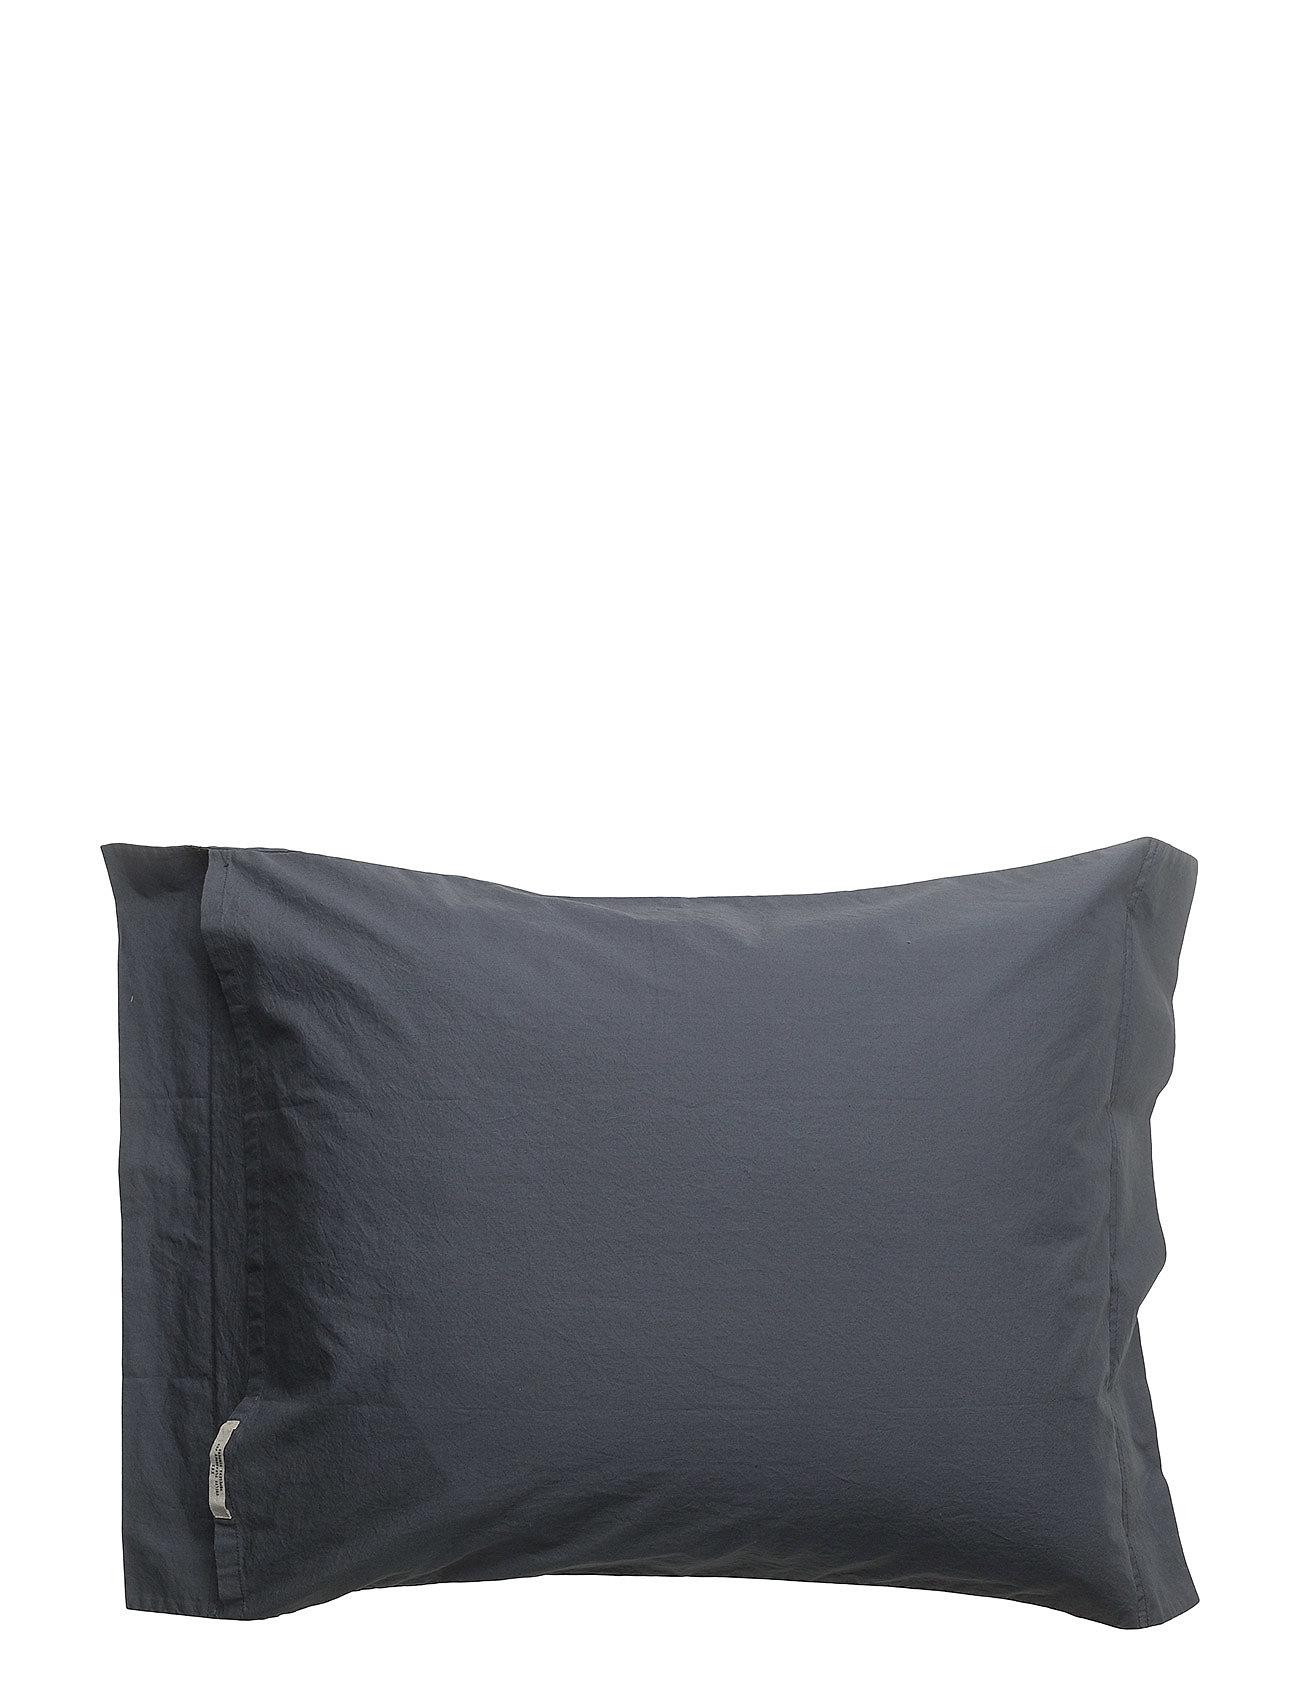 Pillow Head Triple CasenavyDirty X Linen 0PwOkn